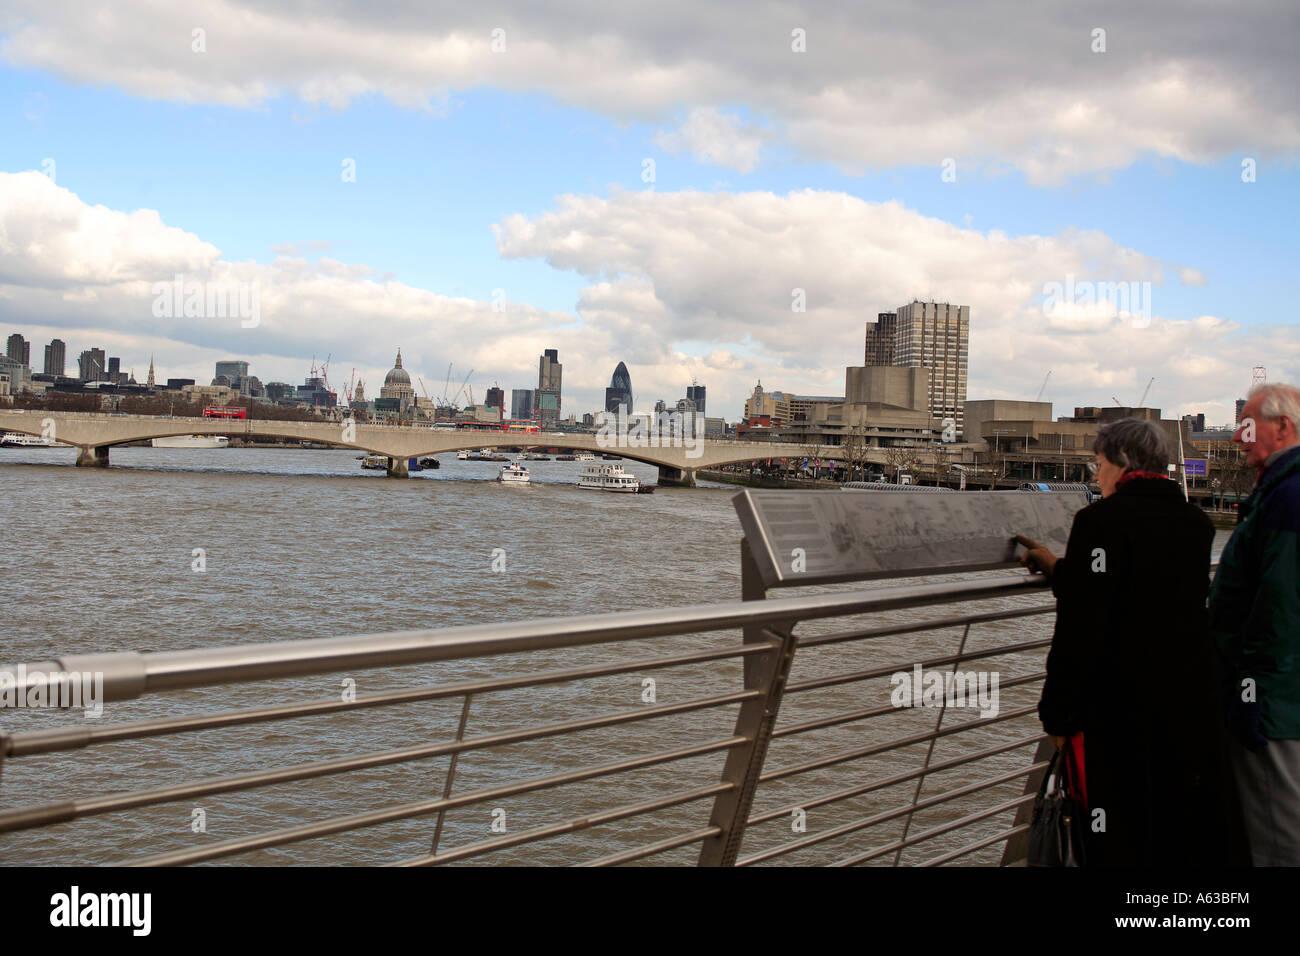 united kingdom central london view towards waterloo bridge from the jubilee pedestrian bridge - Stock Image